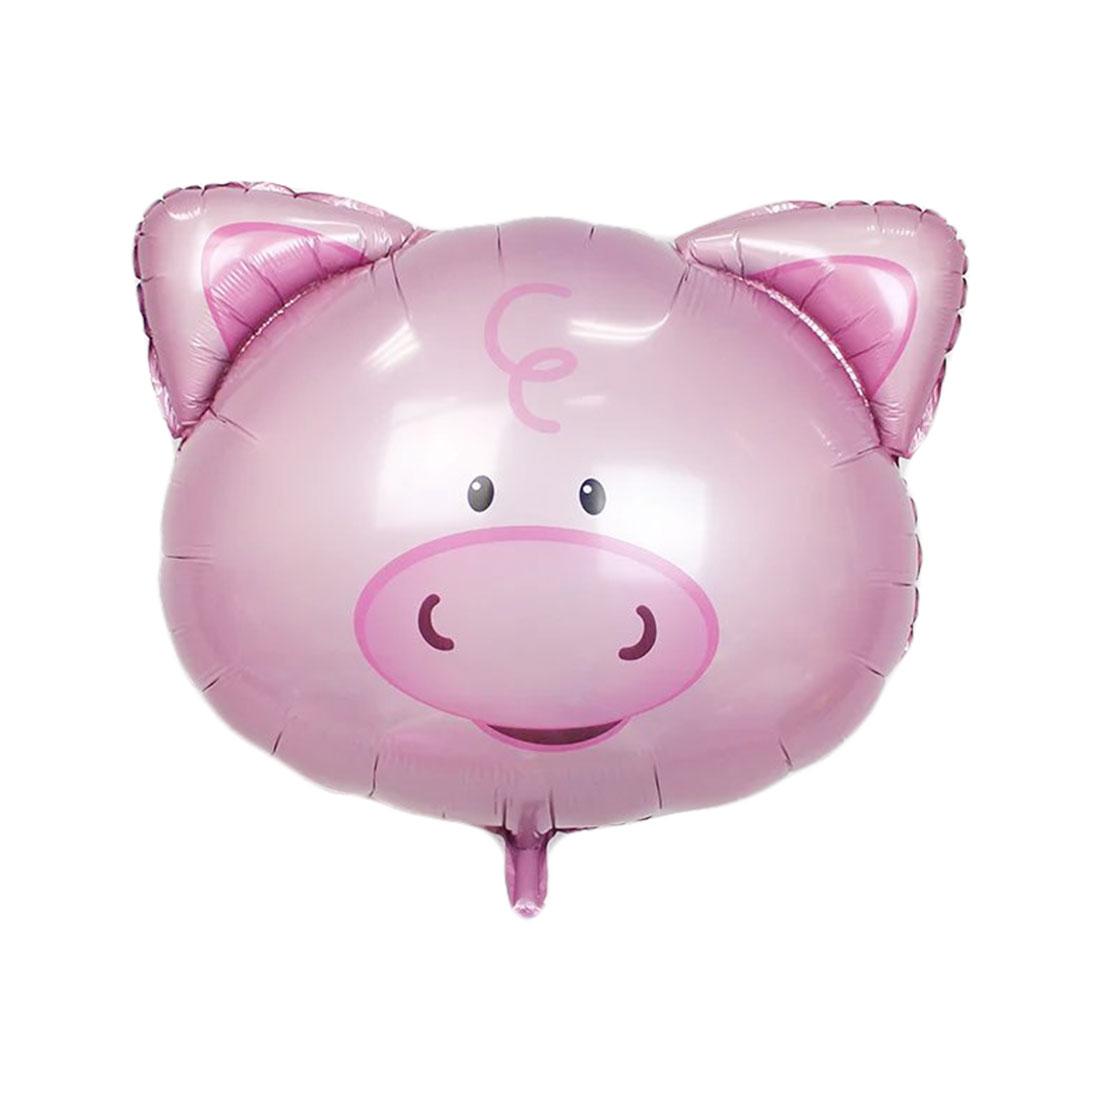 Foil Pig Design Inflation Helium Balloon Birthday Festival Celebration Anniversary Ornament 8 Inch